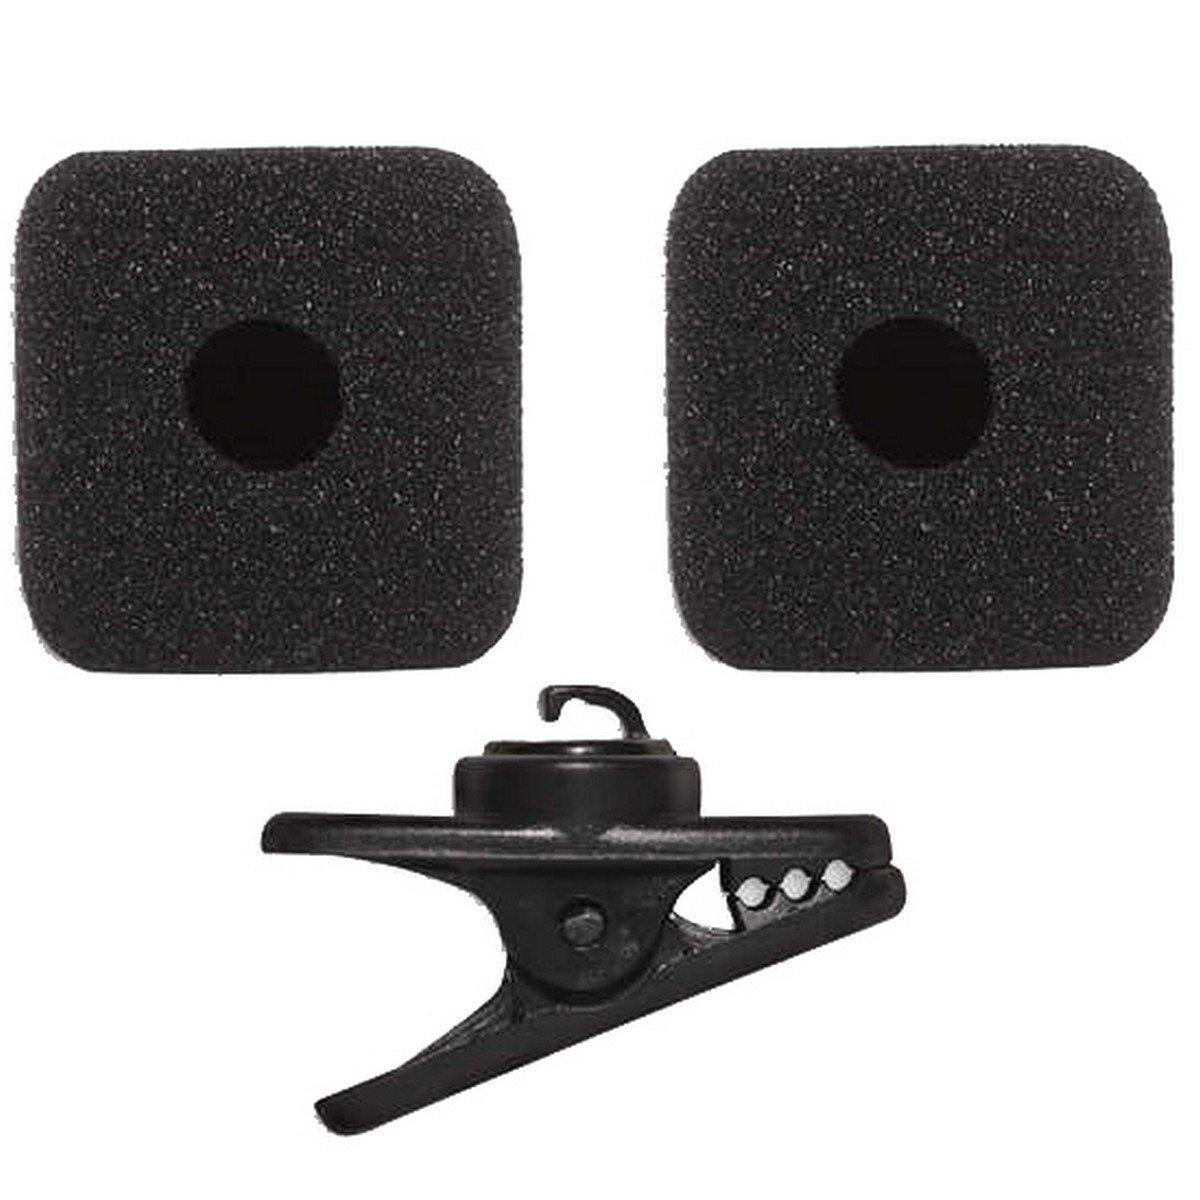 Shure RK377   Replacement Clip 2 Foam Windscreens for PGA31 Headset Microphone